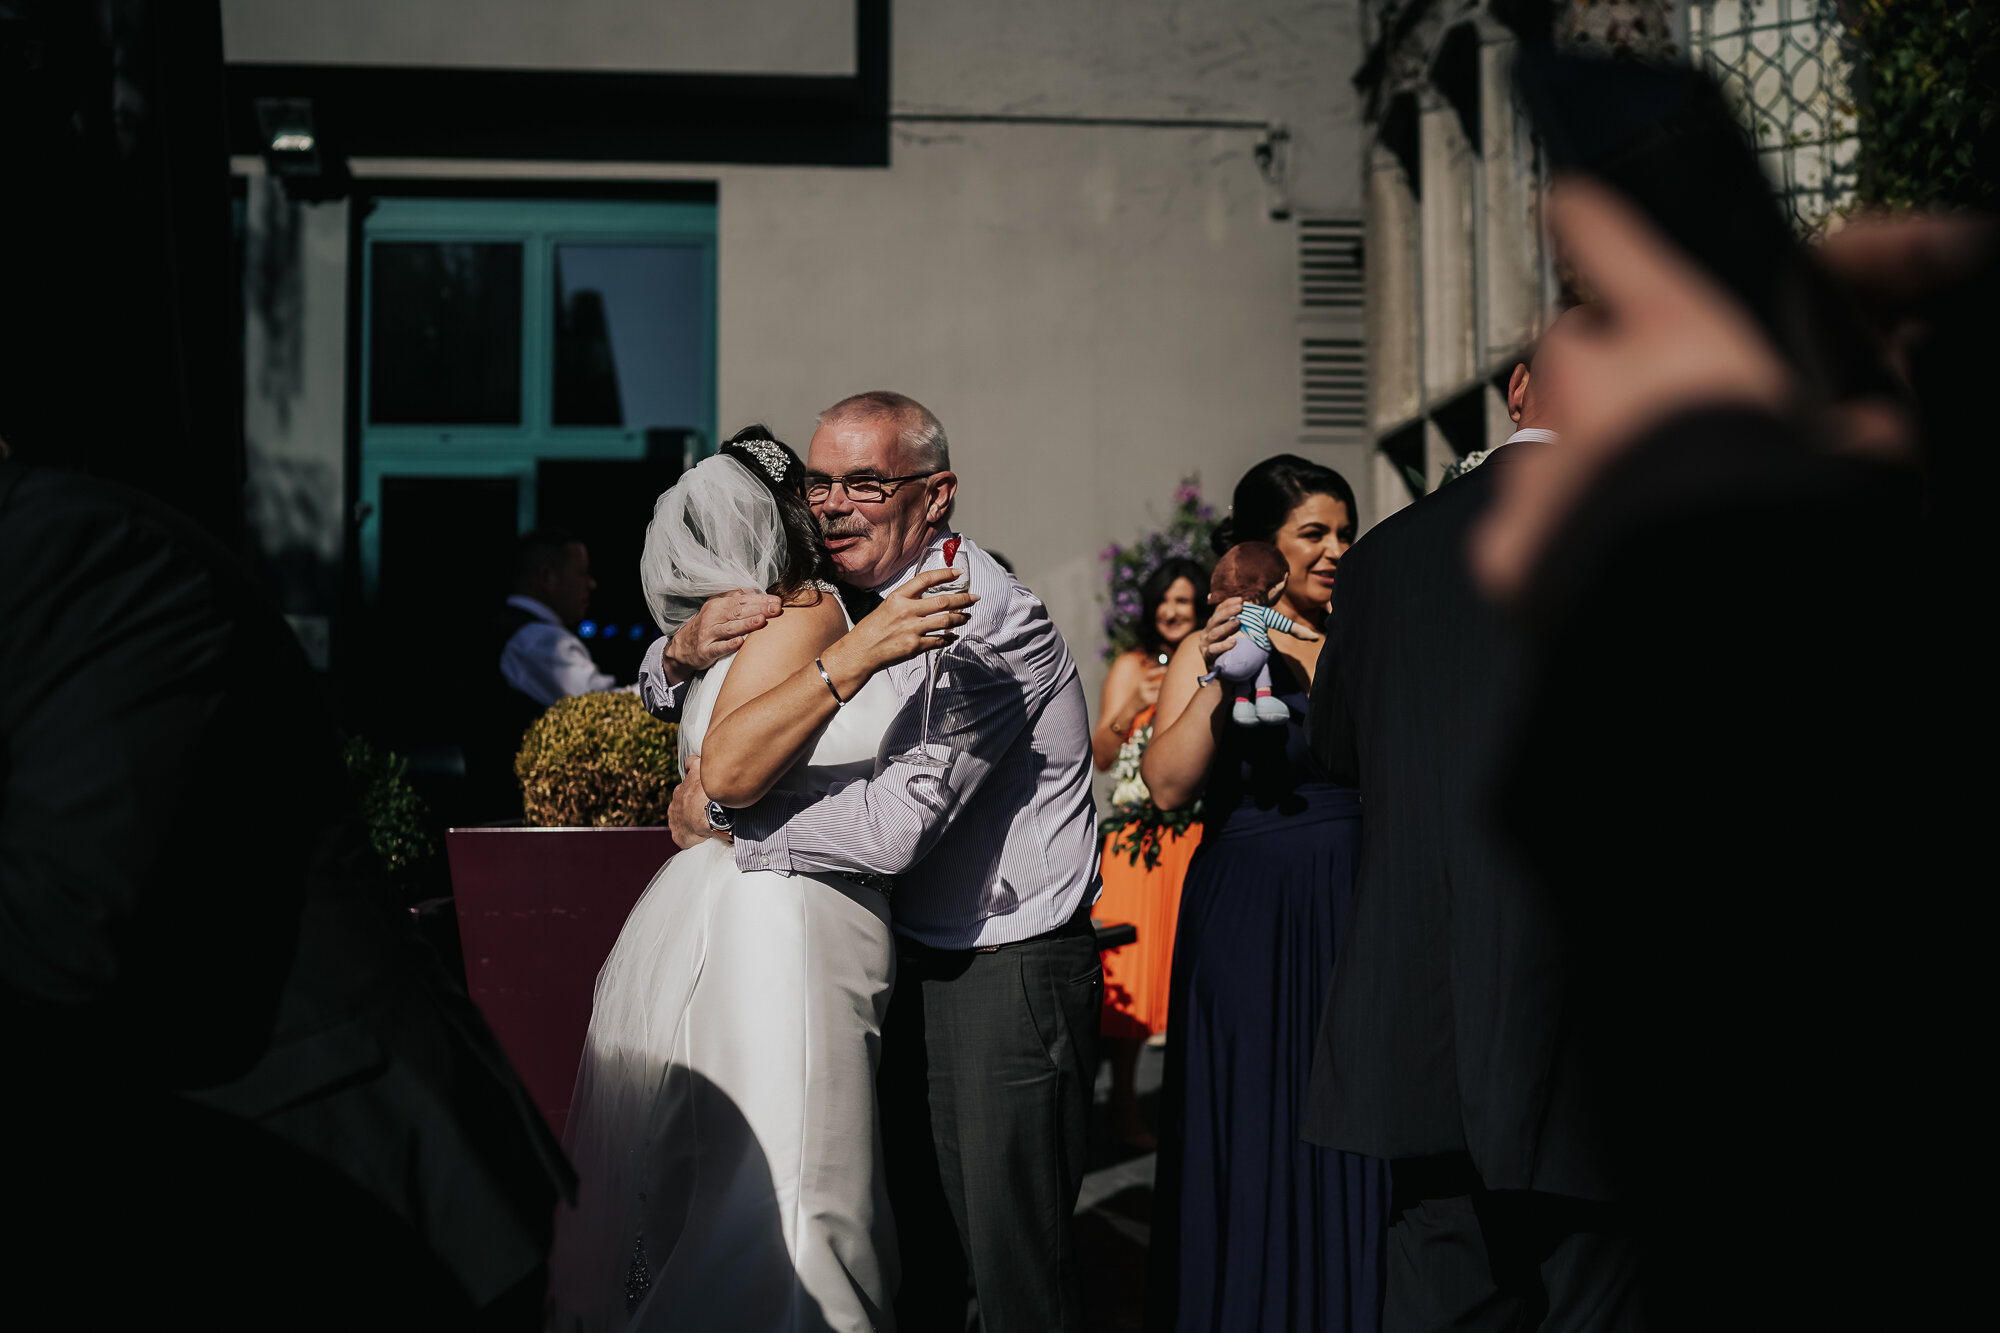 Clontarf Caste wedding photographer Wedding Photography dublin ireland wedding photographer (40 of 58).jpg